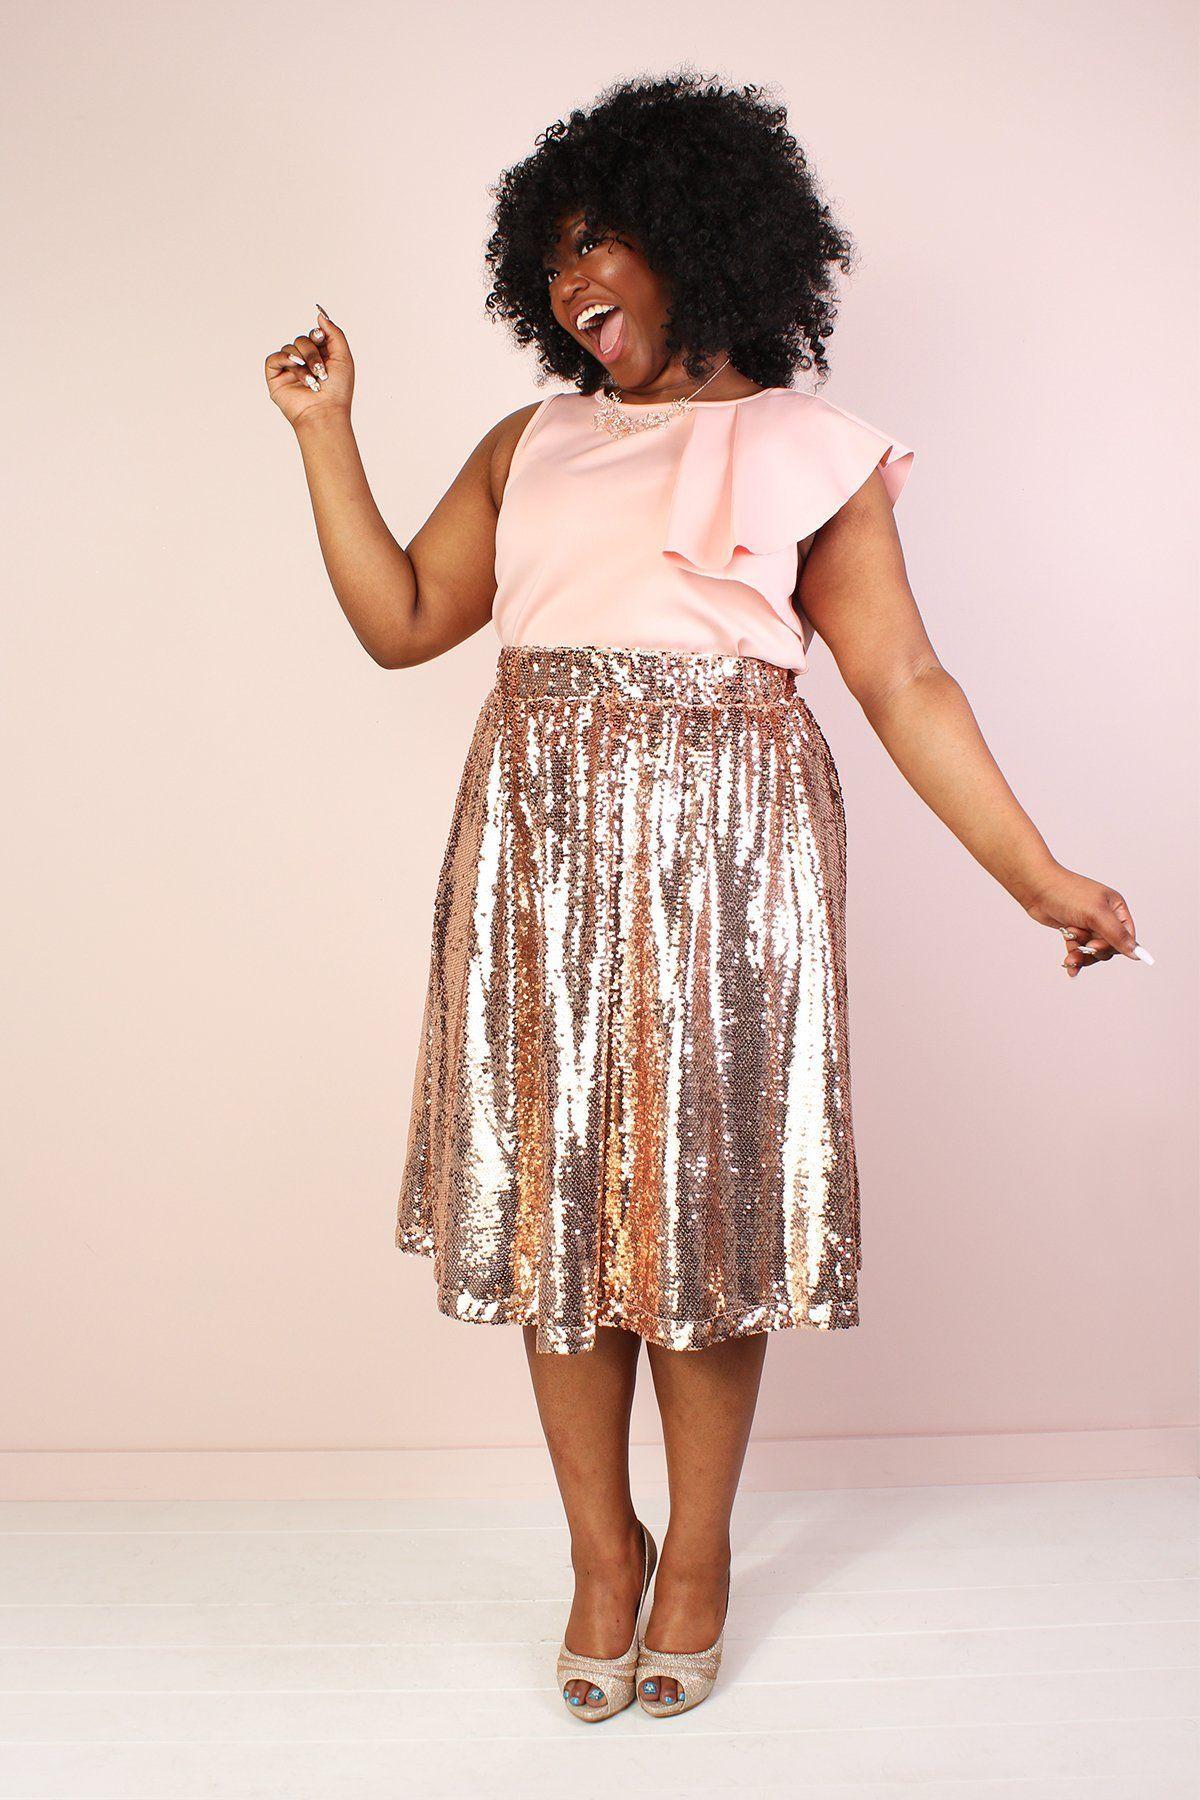 59b2addf3ac Plus Size Sequin Skirt - Rose Gold